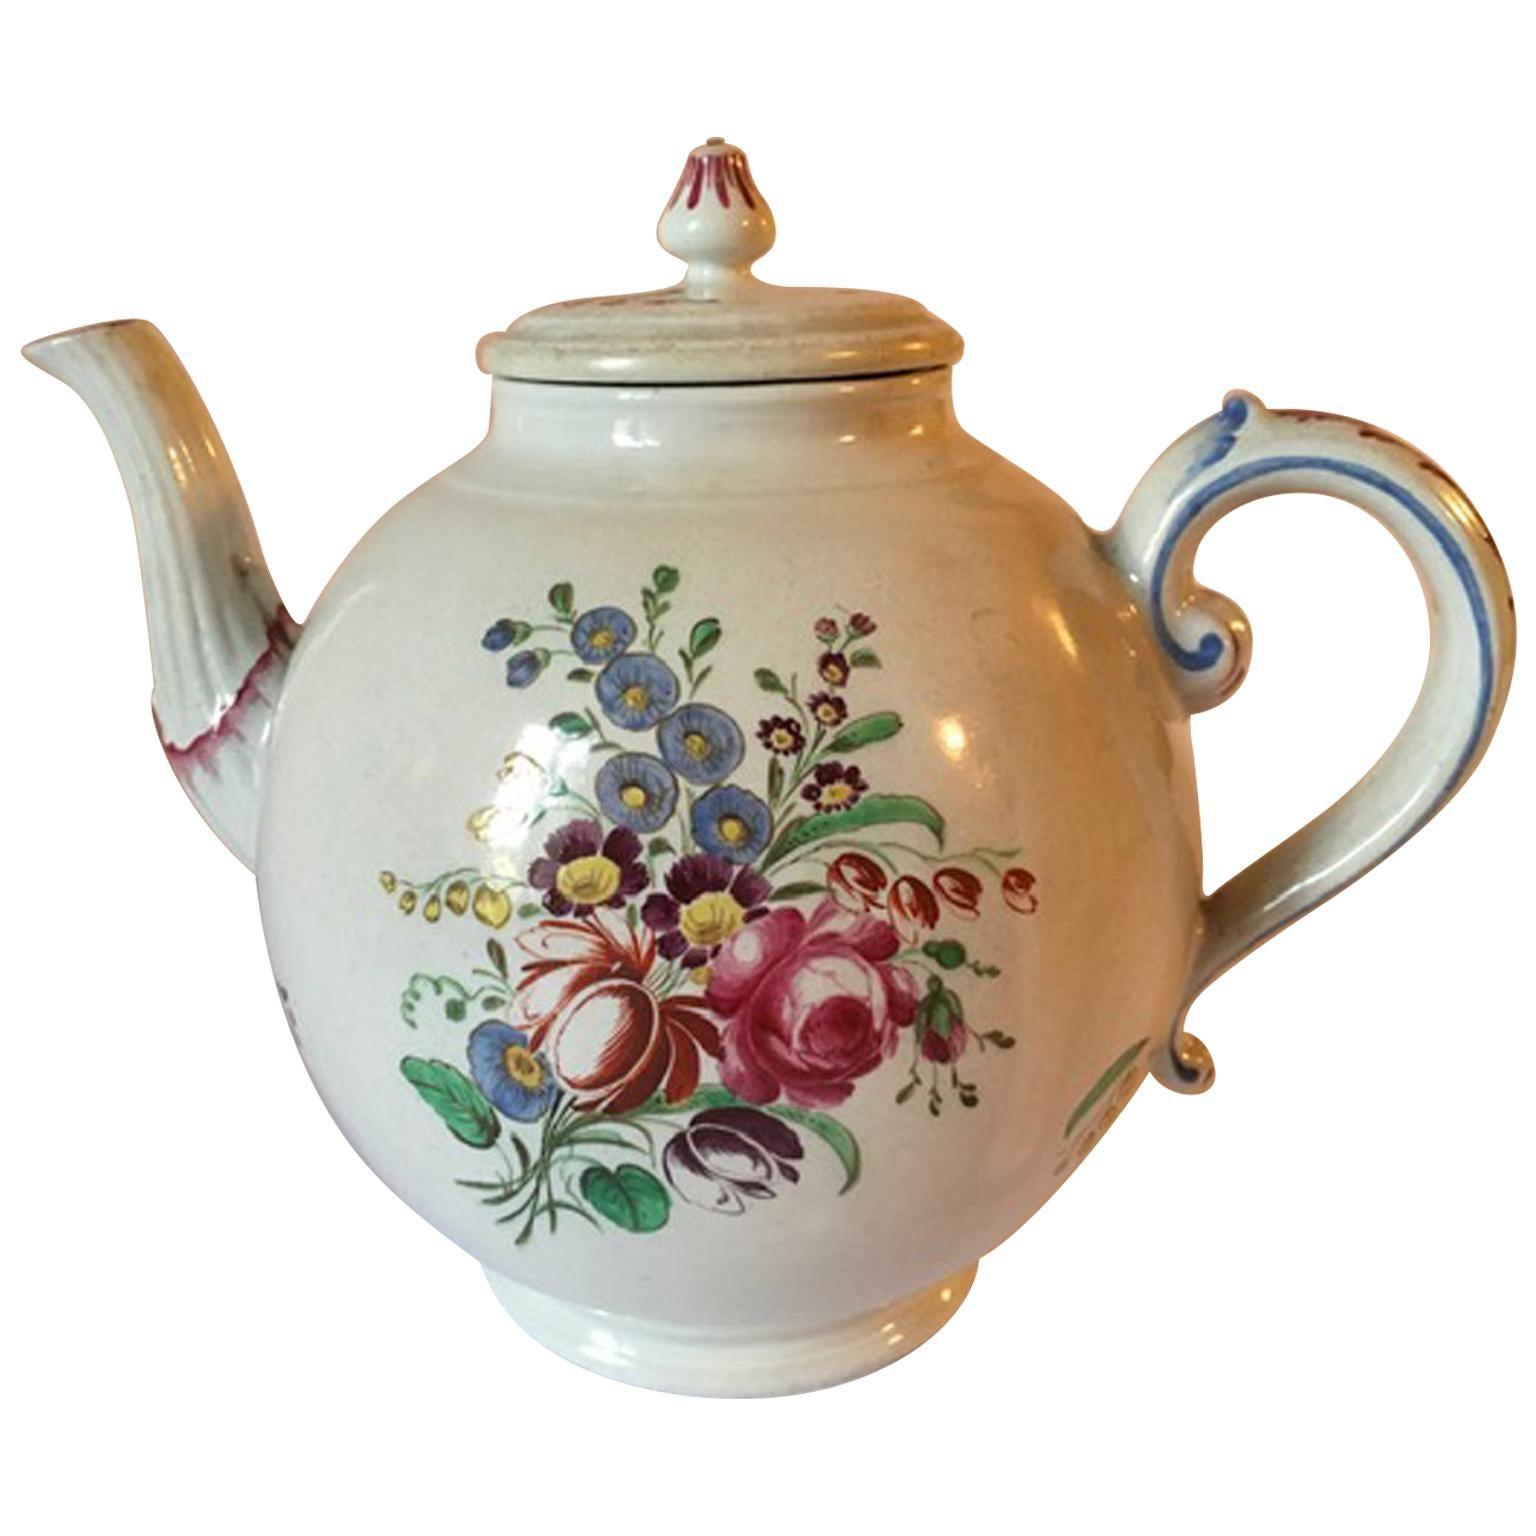 Italy Late 18th Century Doccia Richard Ginori Porcelain Tea Pot Floral Drawings